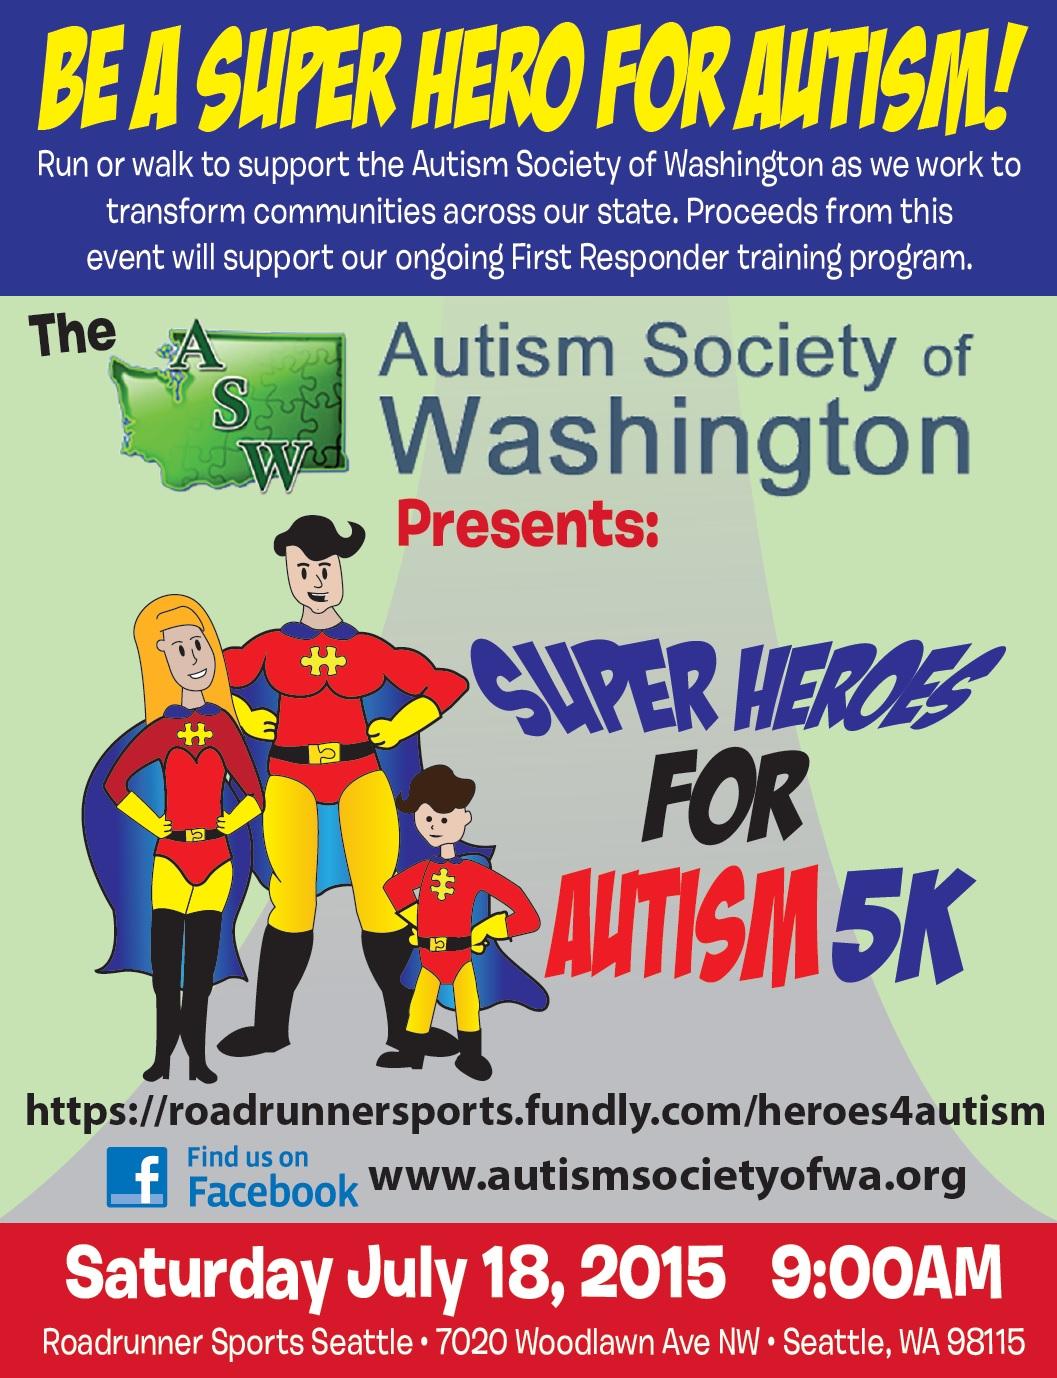 Company Peddling Unproven Autism >> Autism Society Of Washington Super Heroes For Autism 5k